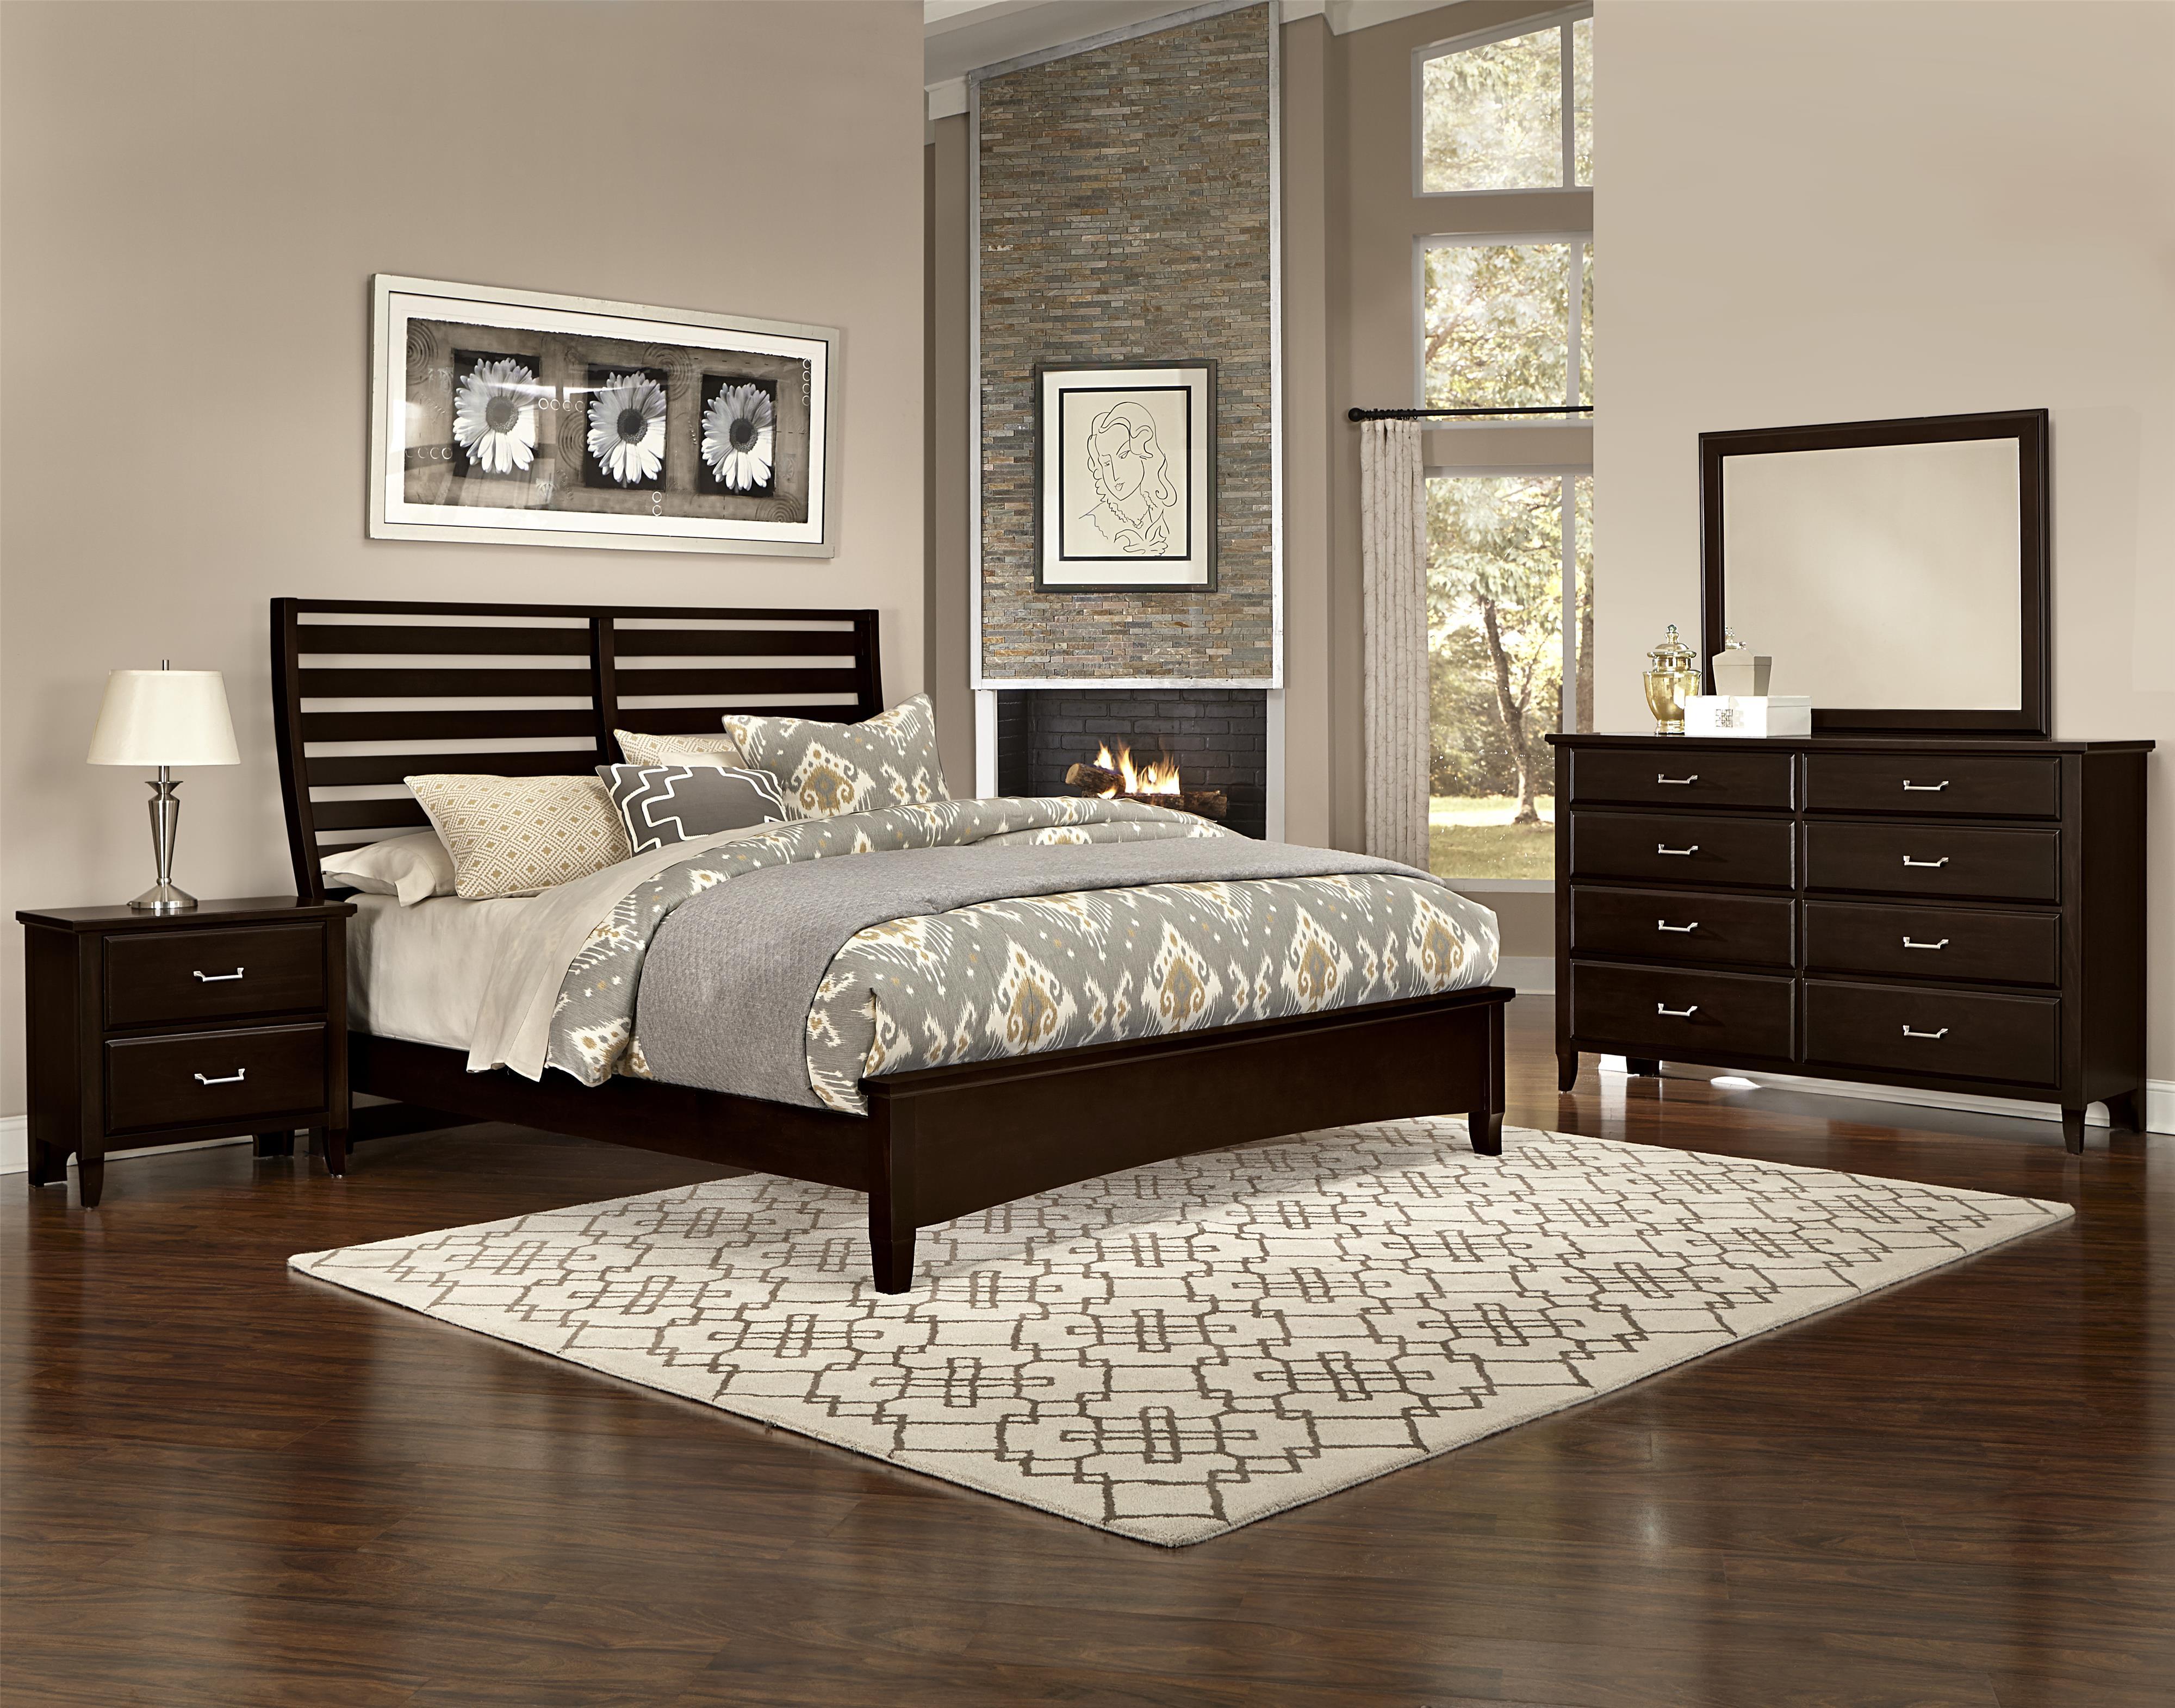 Vaughan Bassett Commentary King Bedroom Group - Item Number: 390 K Bedroom Group 2